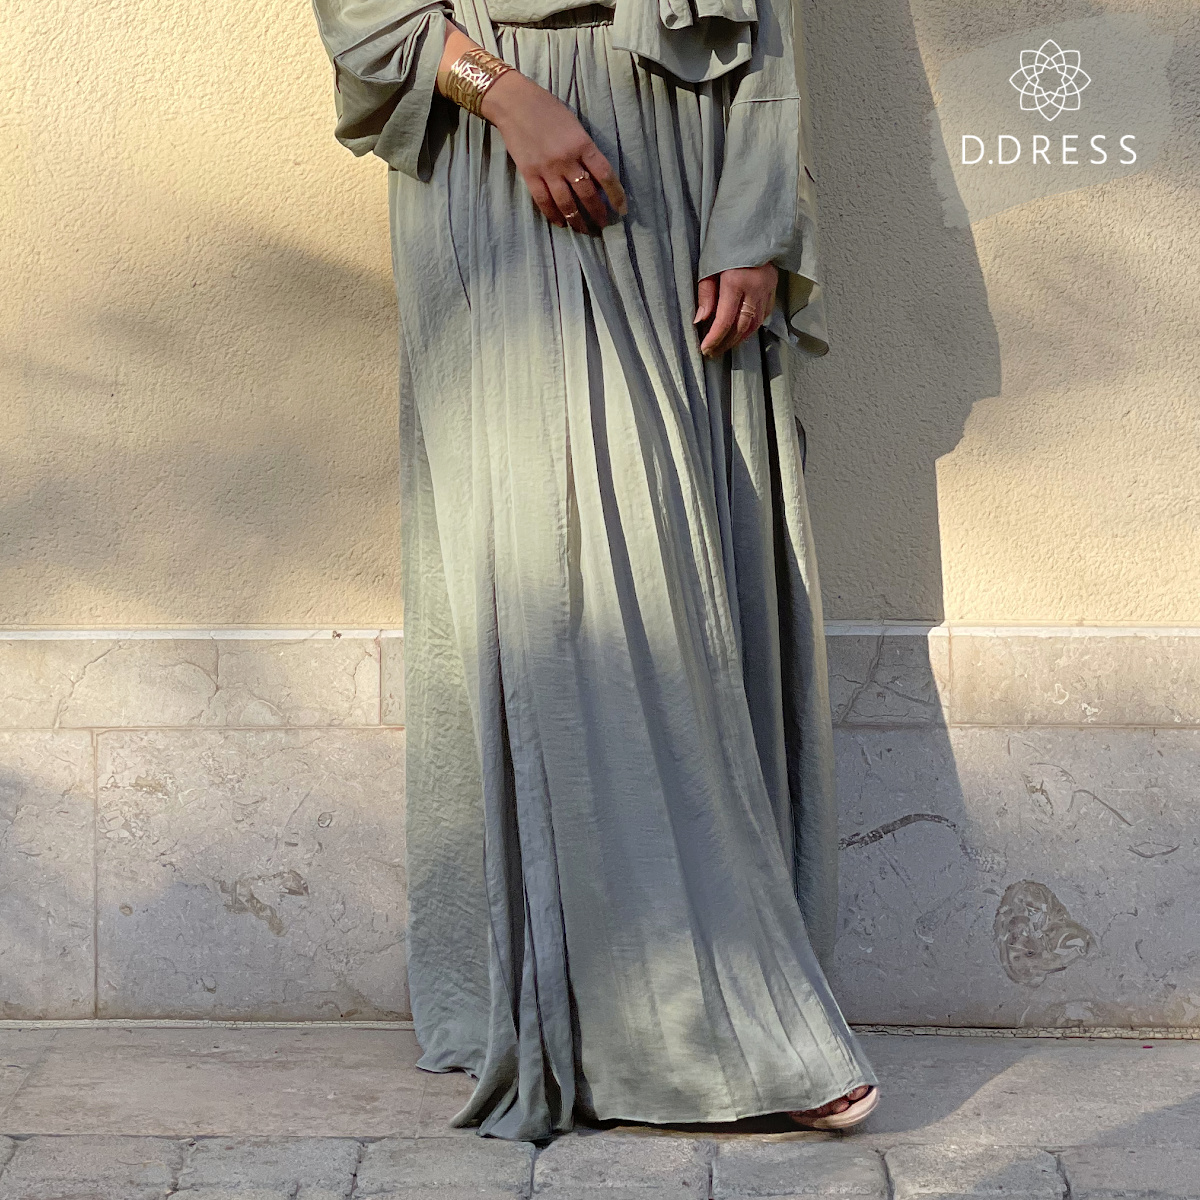 jupe skirt hareer abaya ddress sage green